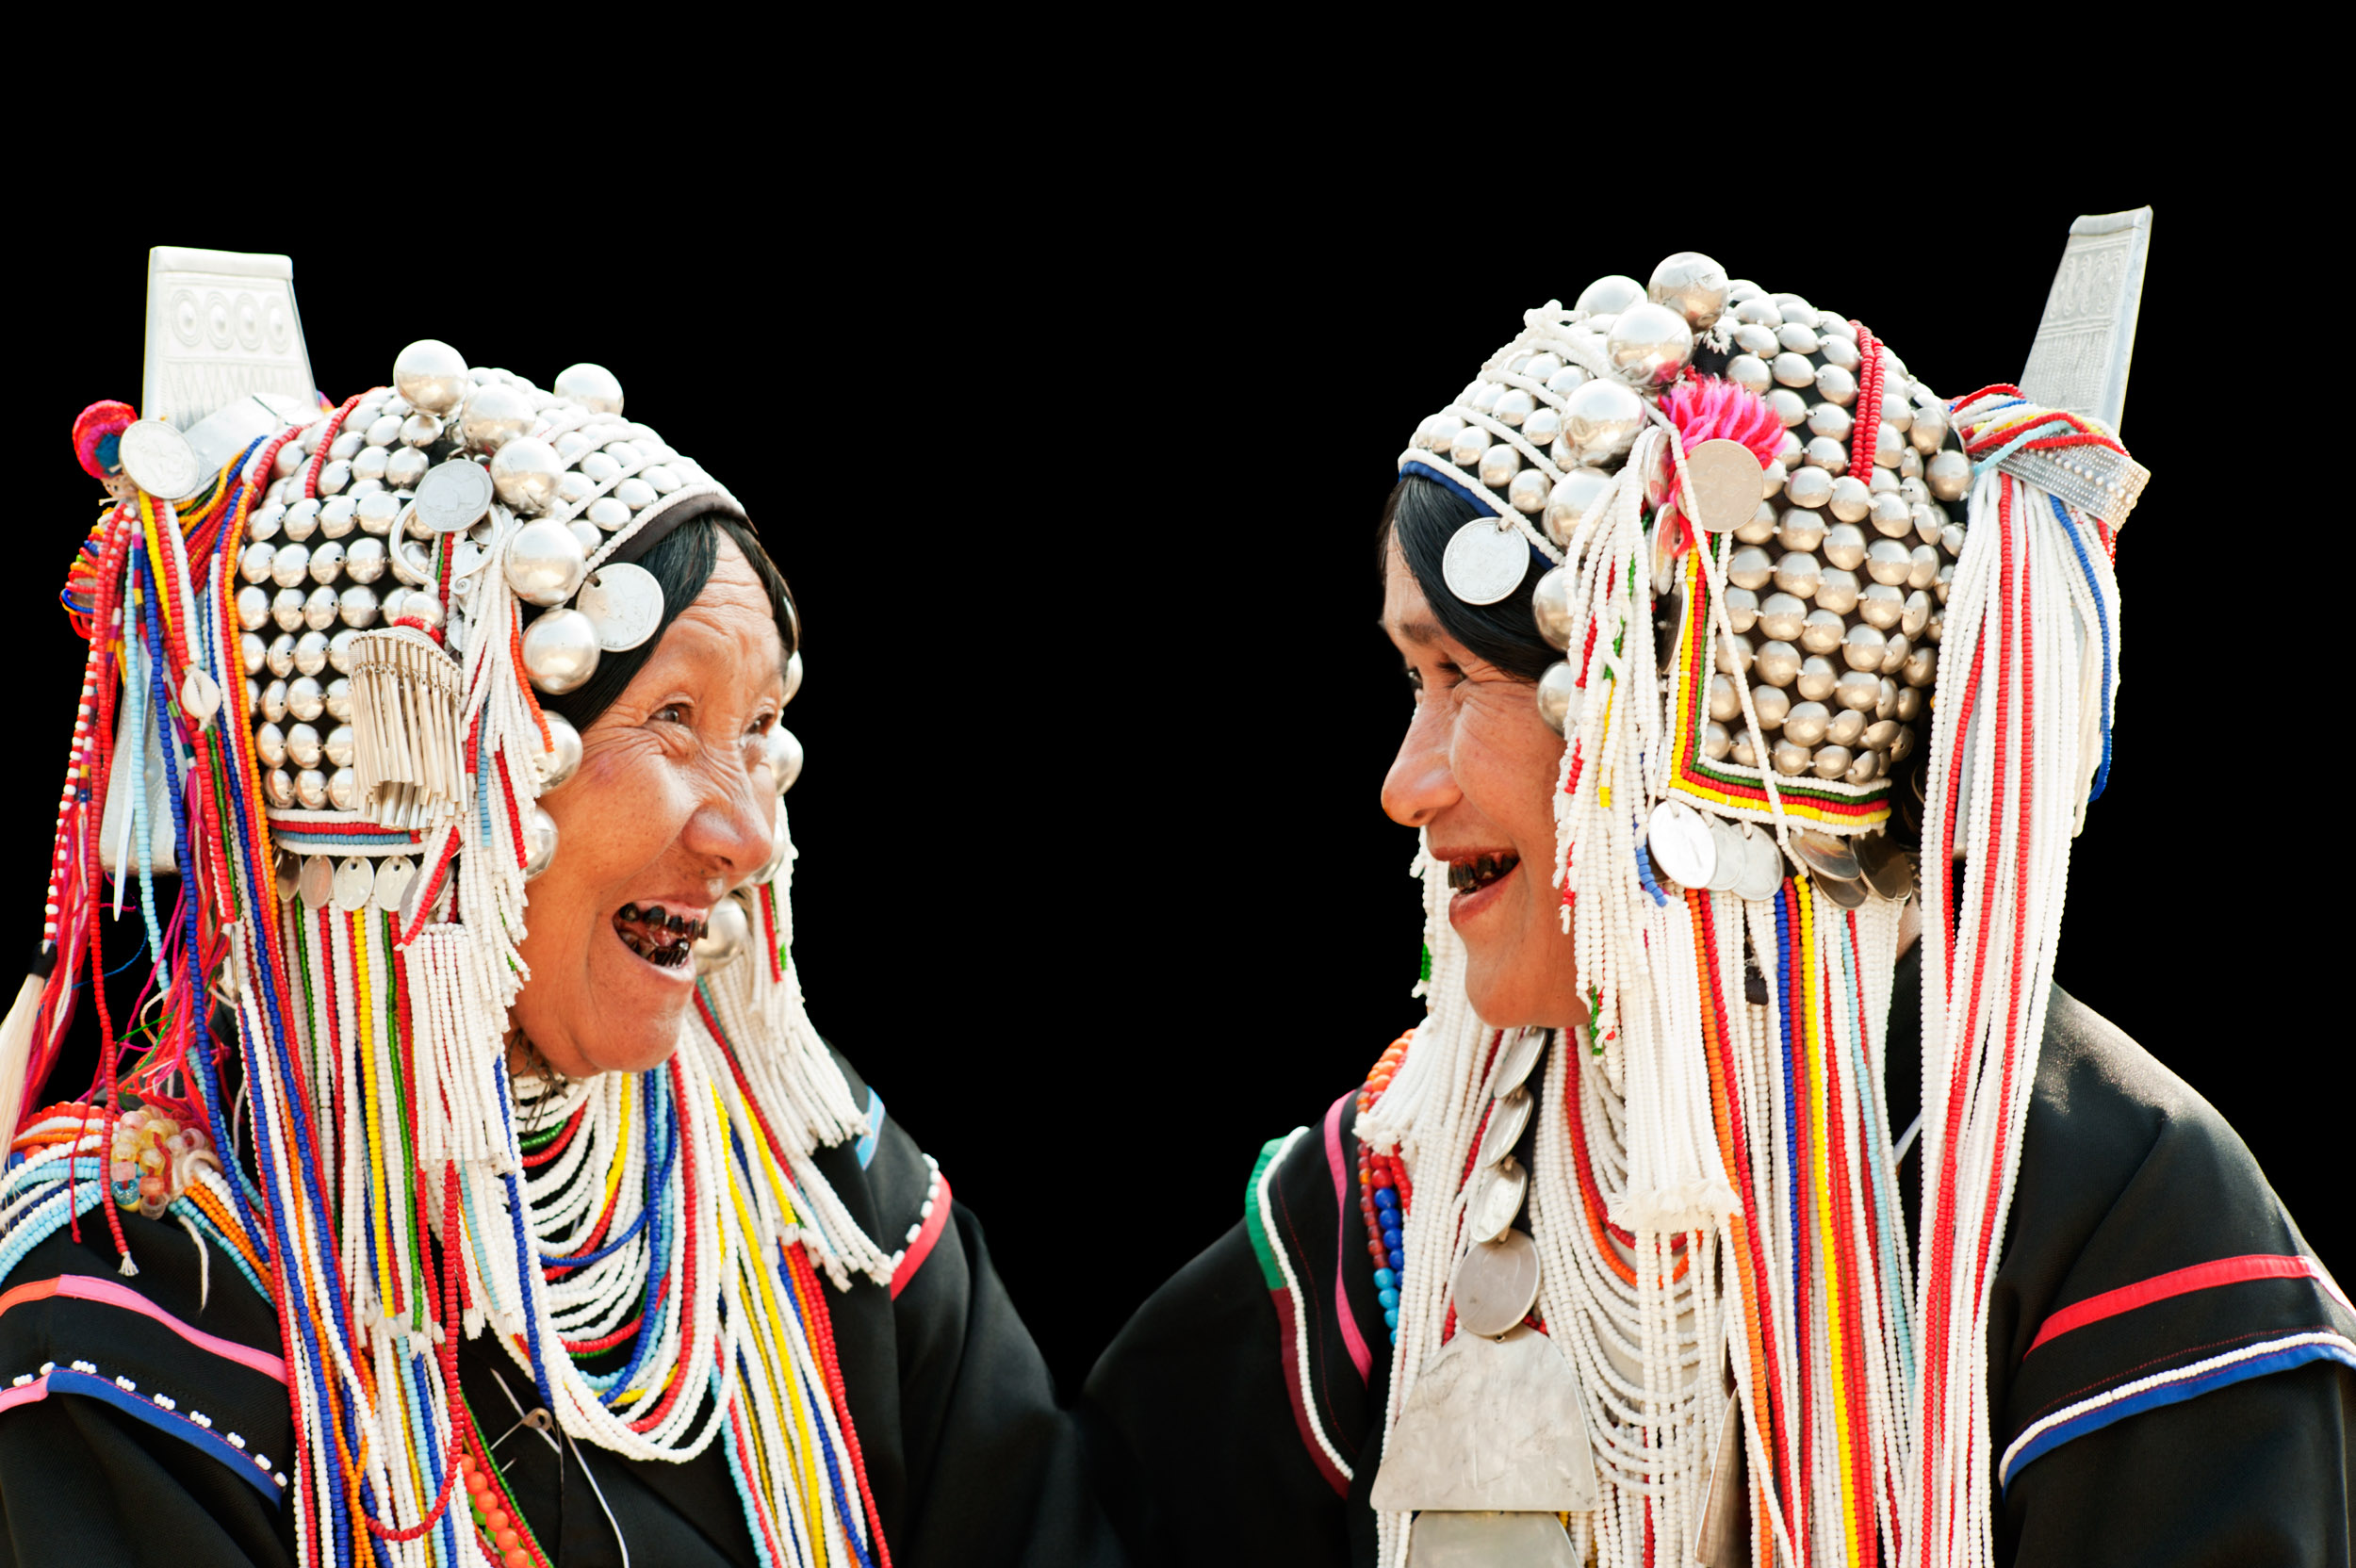 Two Akha woman having a laugh portrait photography idea